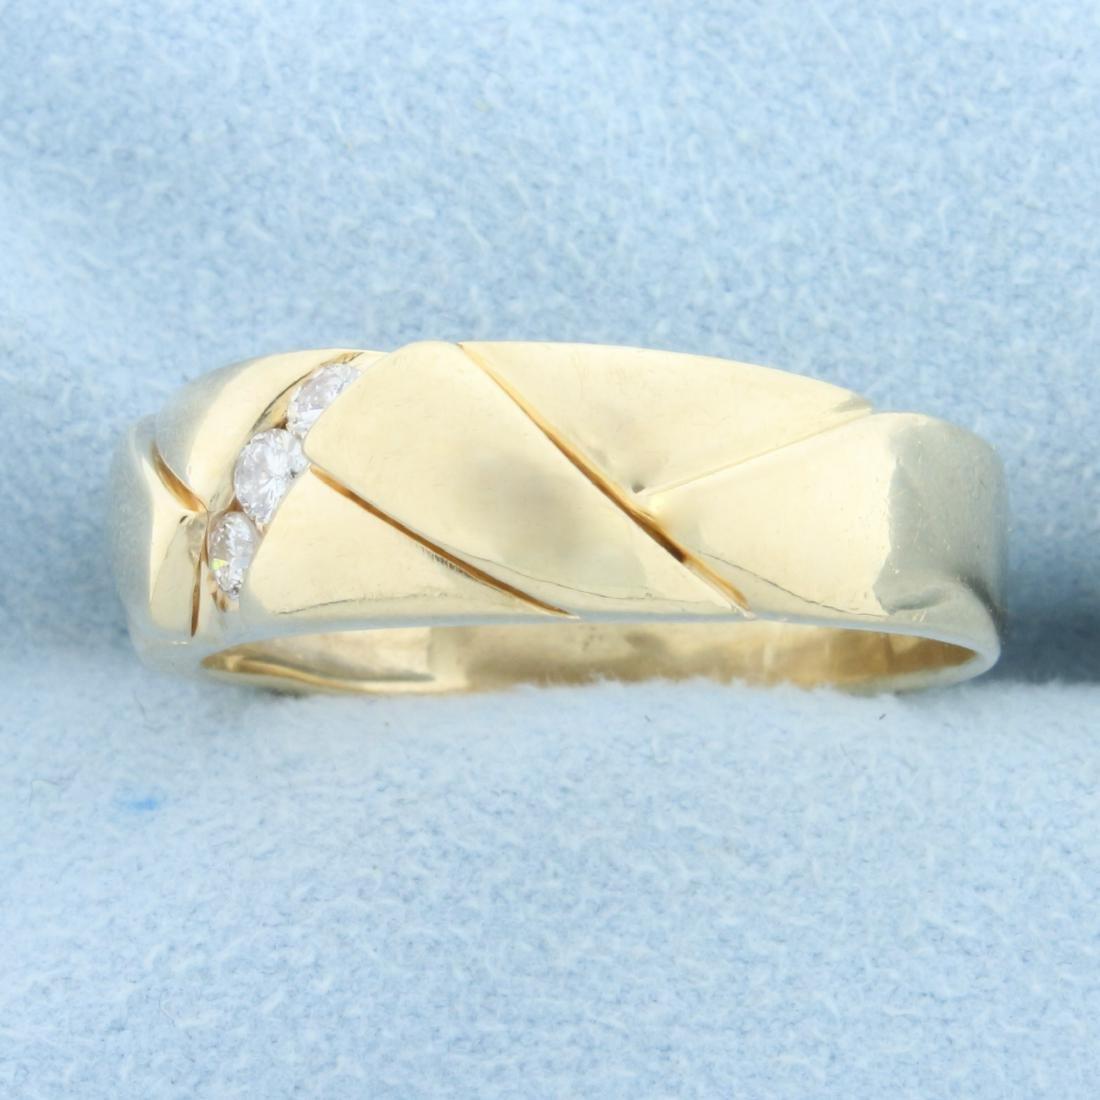 Men's Diamond Wedding or Anniversary Band Ring in 14K - 2